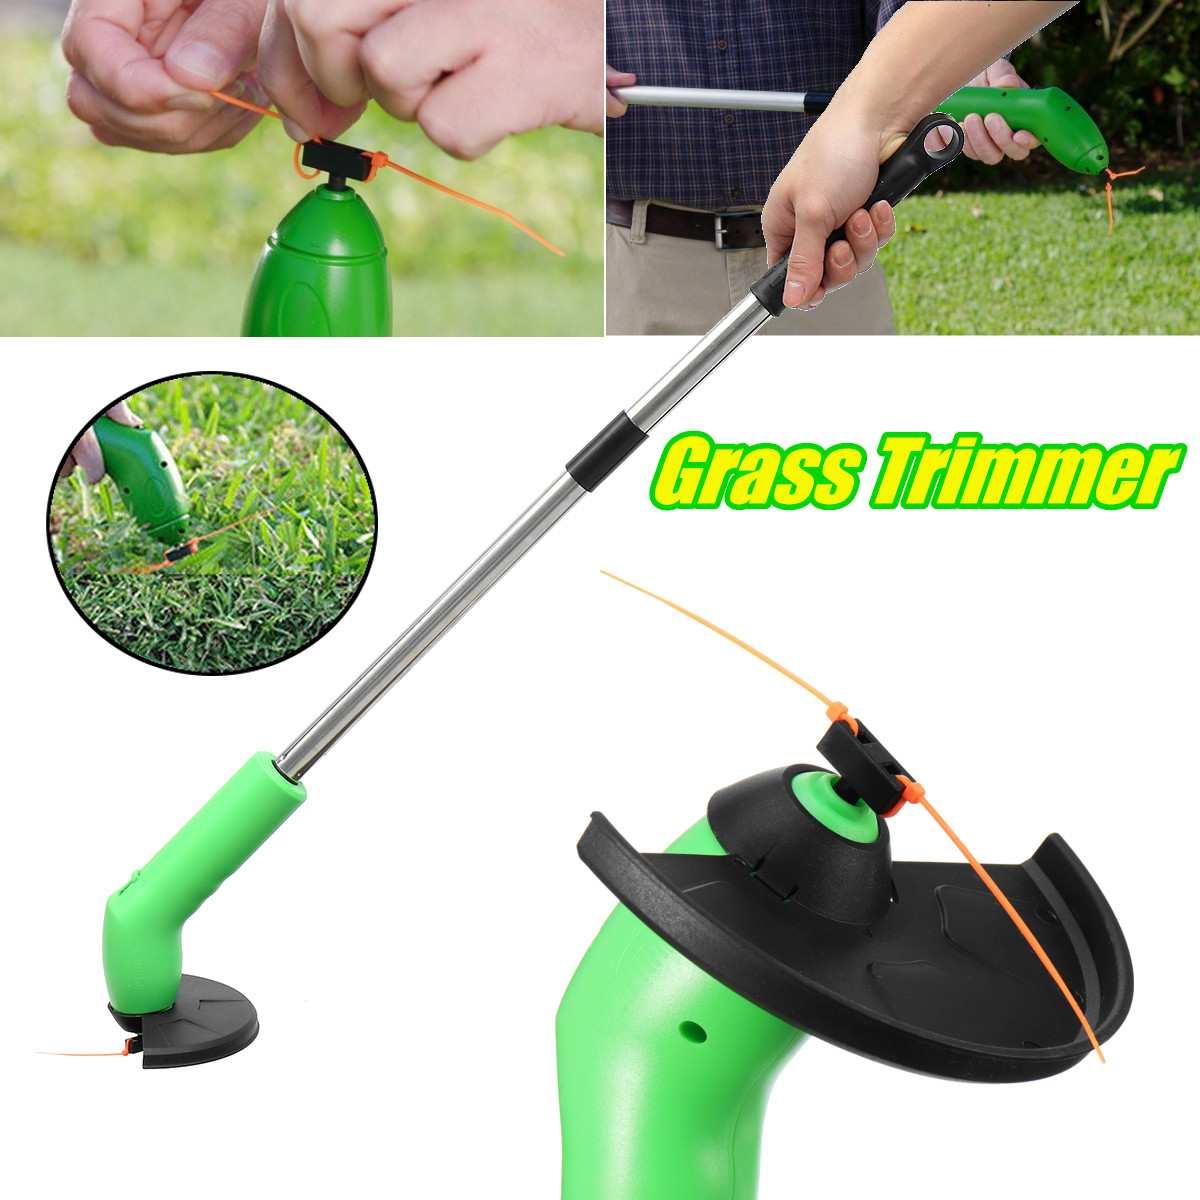 Retractable Grass Trimmer Cutter Lawn Mower Cordless Lawnmower Garden WeedRemover Edging Ties Portable Garden Power Tools